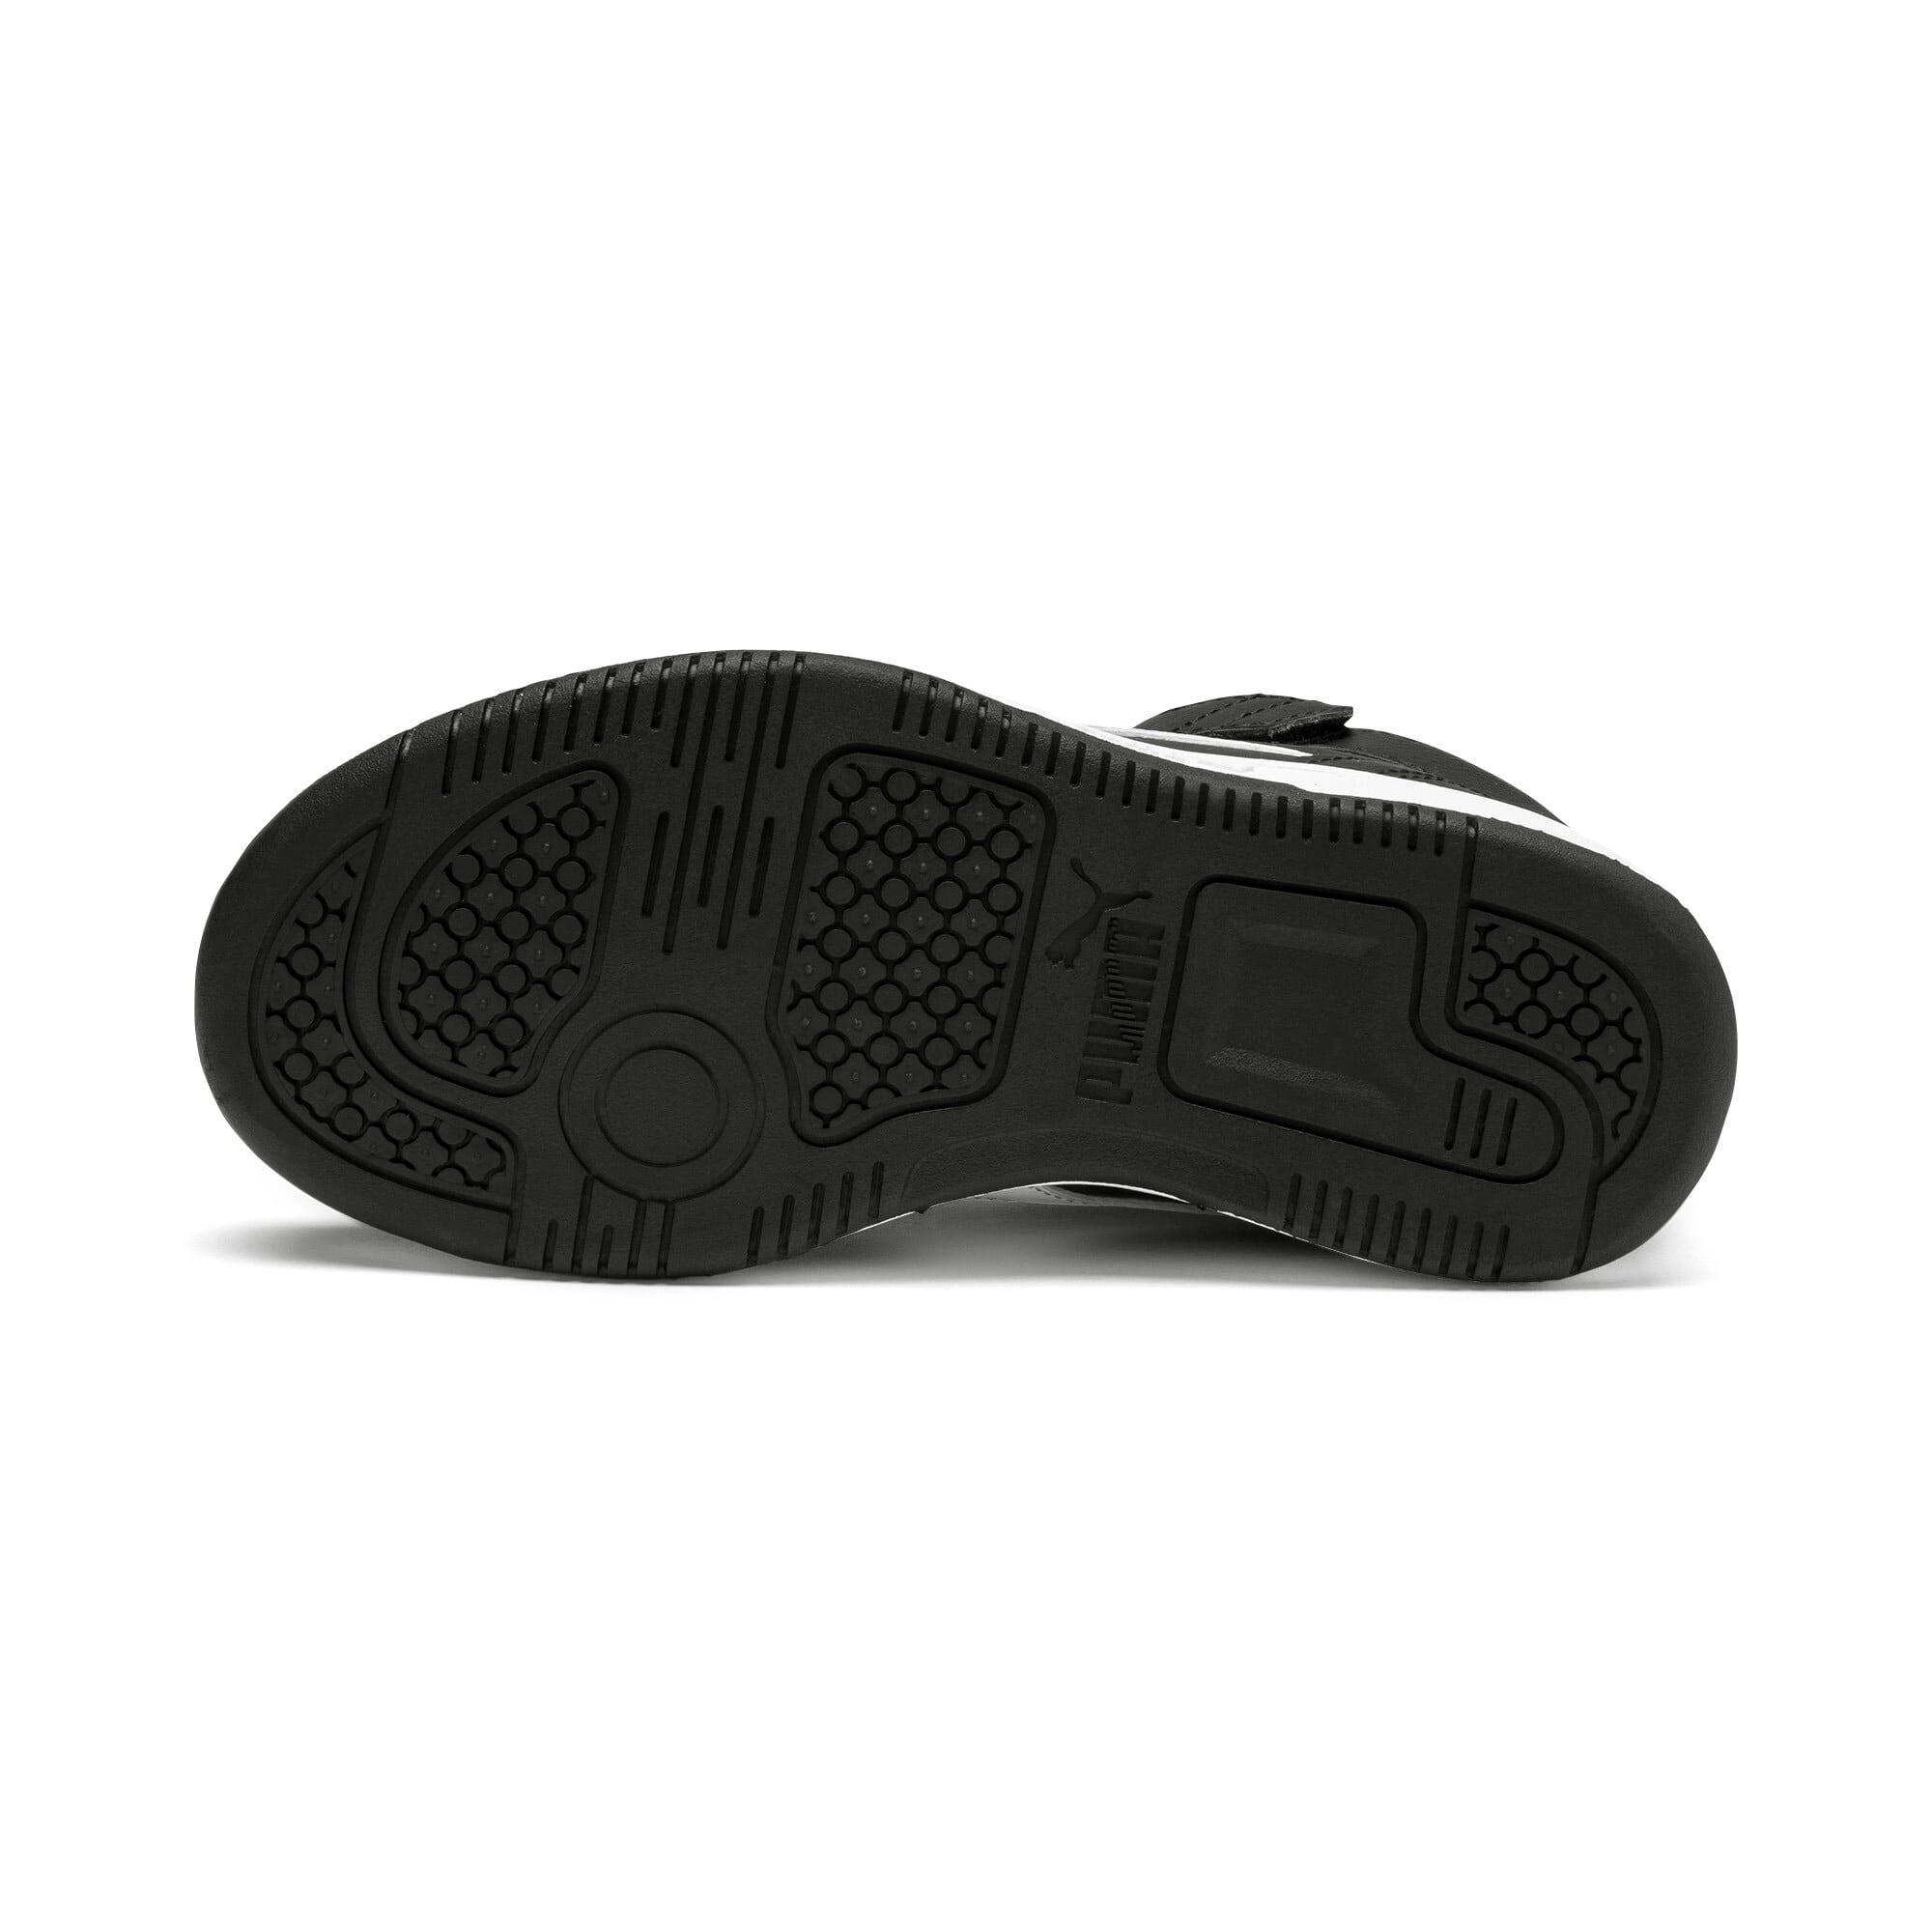 Thumbnail 4 of PUMA Rebound LayUp Little Kids' Shoes, Puma Black-Puma White, medium